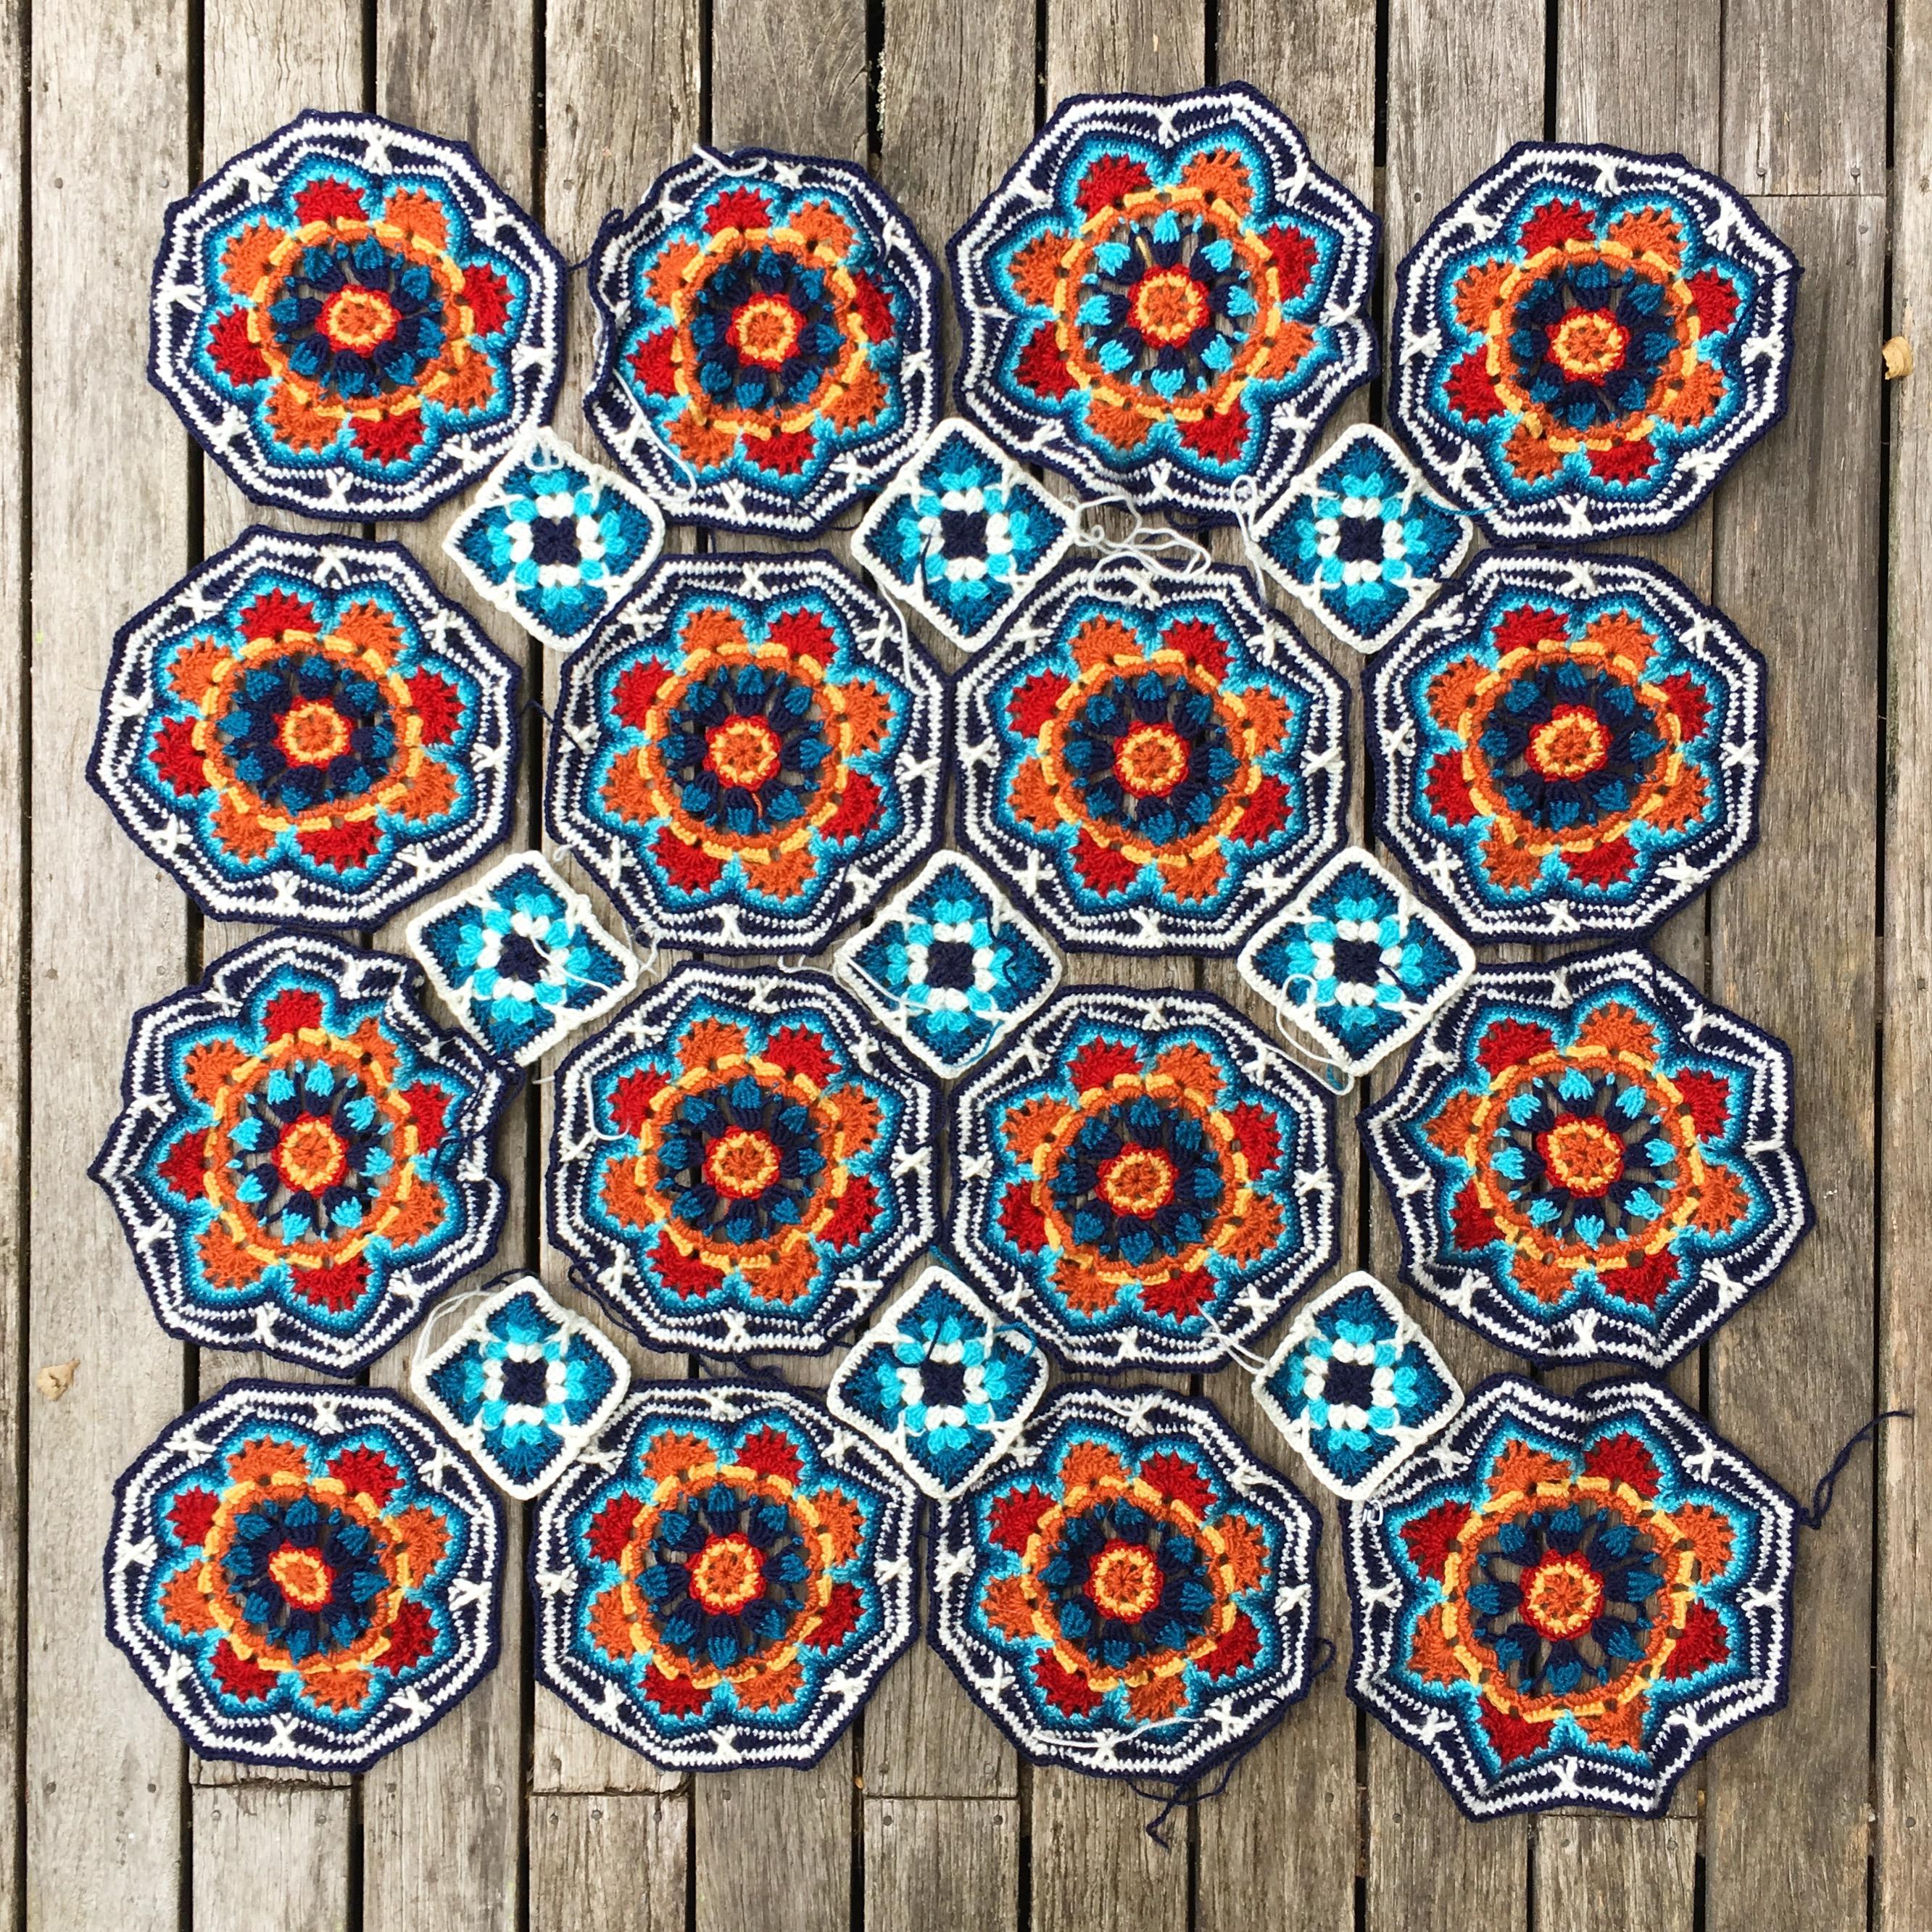 Crochet Archives - amiguru.me